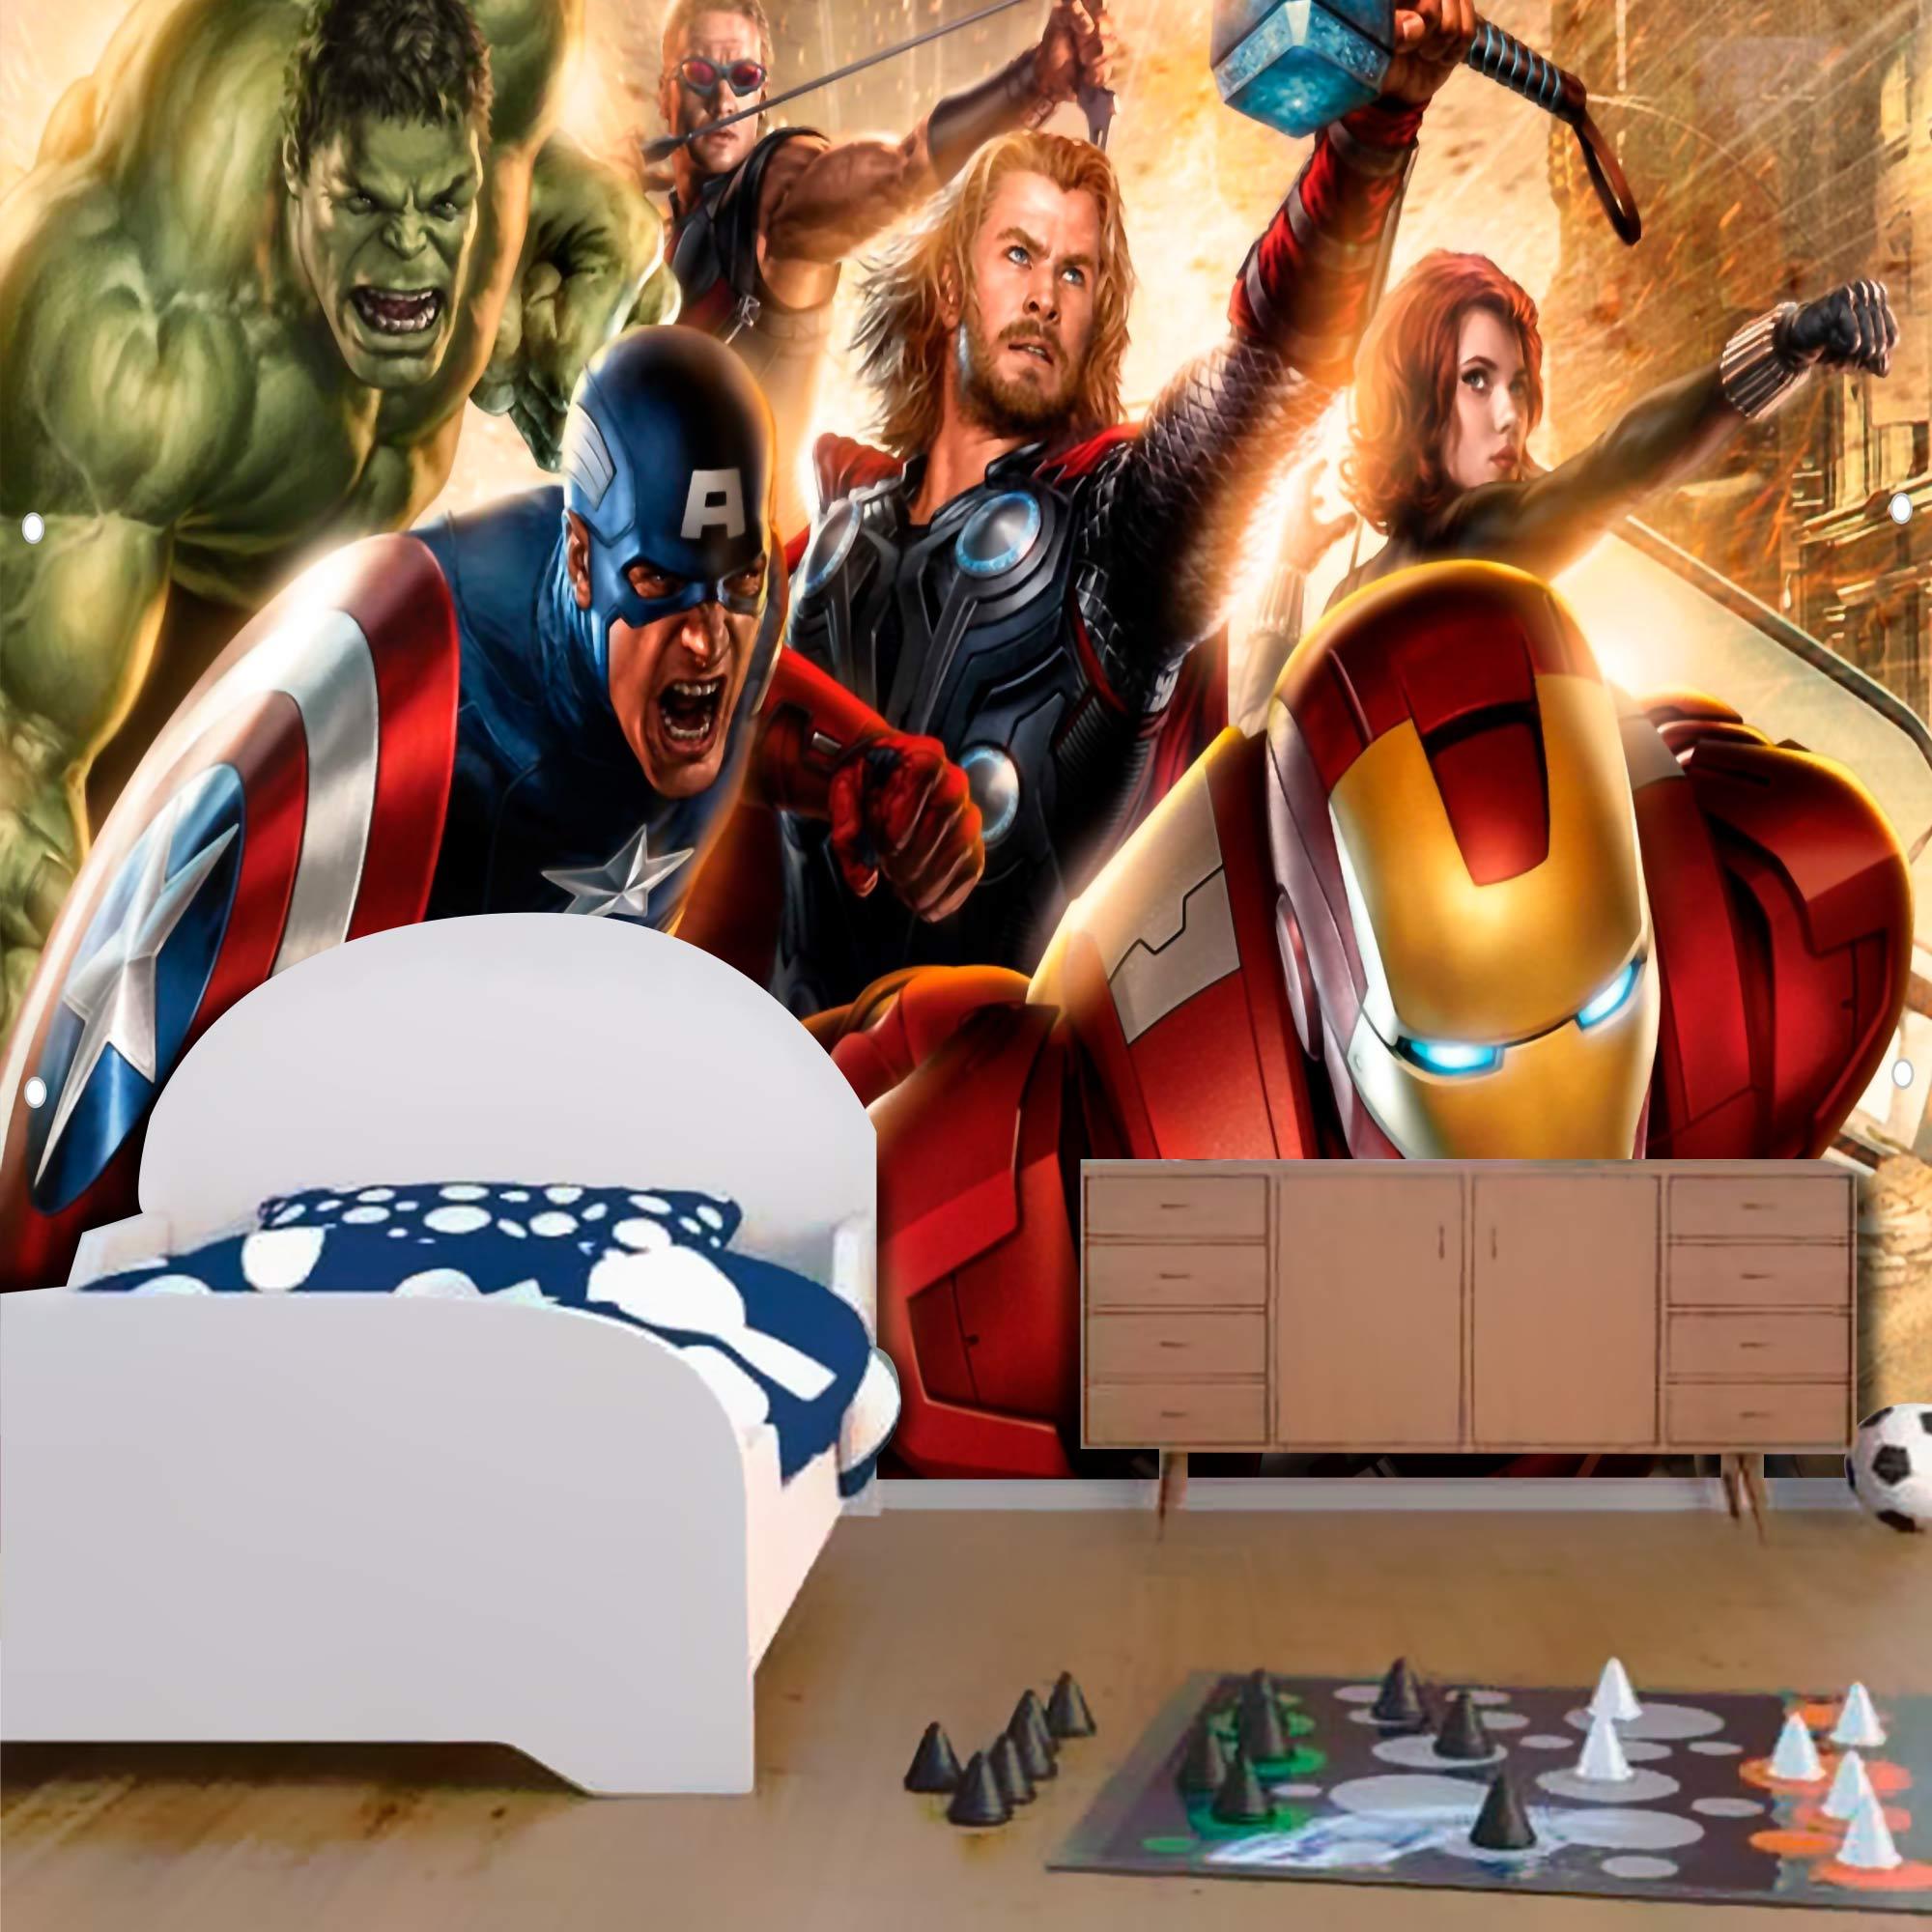 Papel De Parede Adesivo Vingadores Marvel Amarelado 1X1  - Final Decor